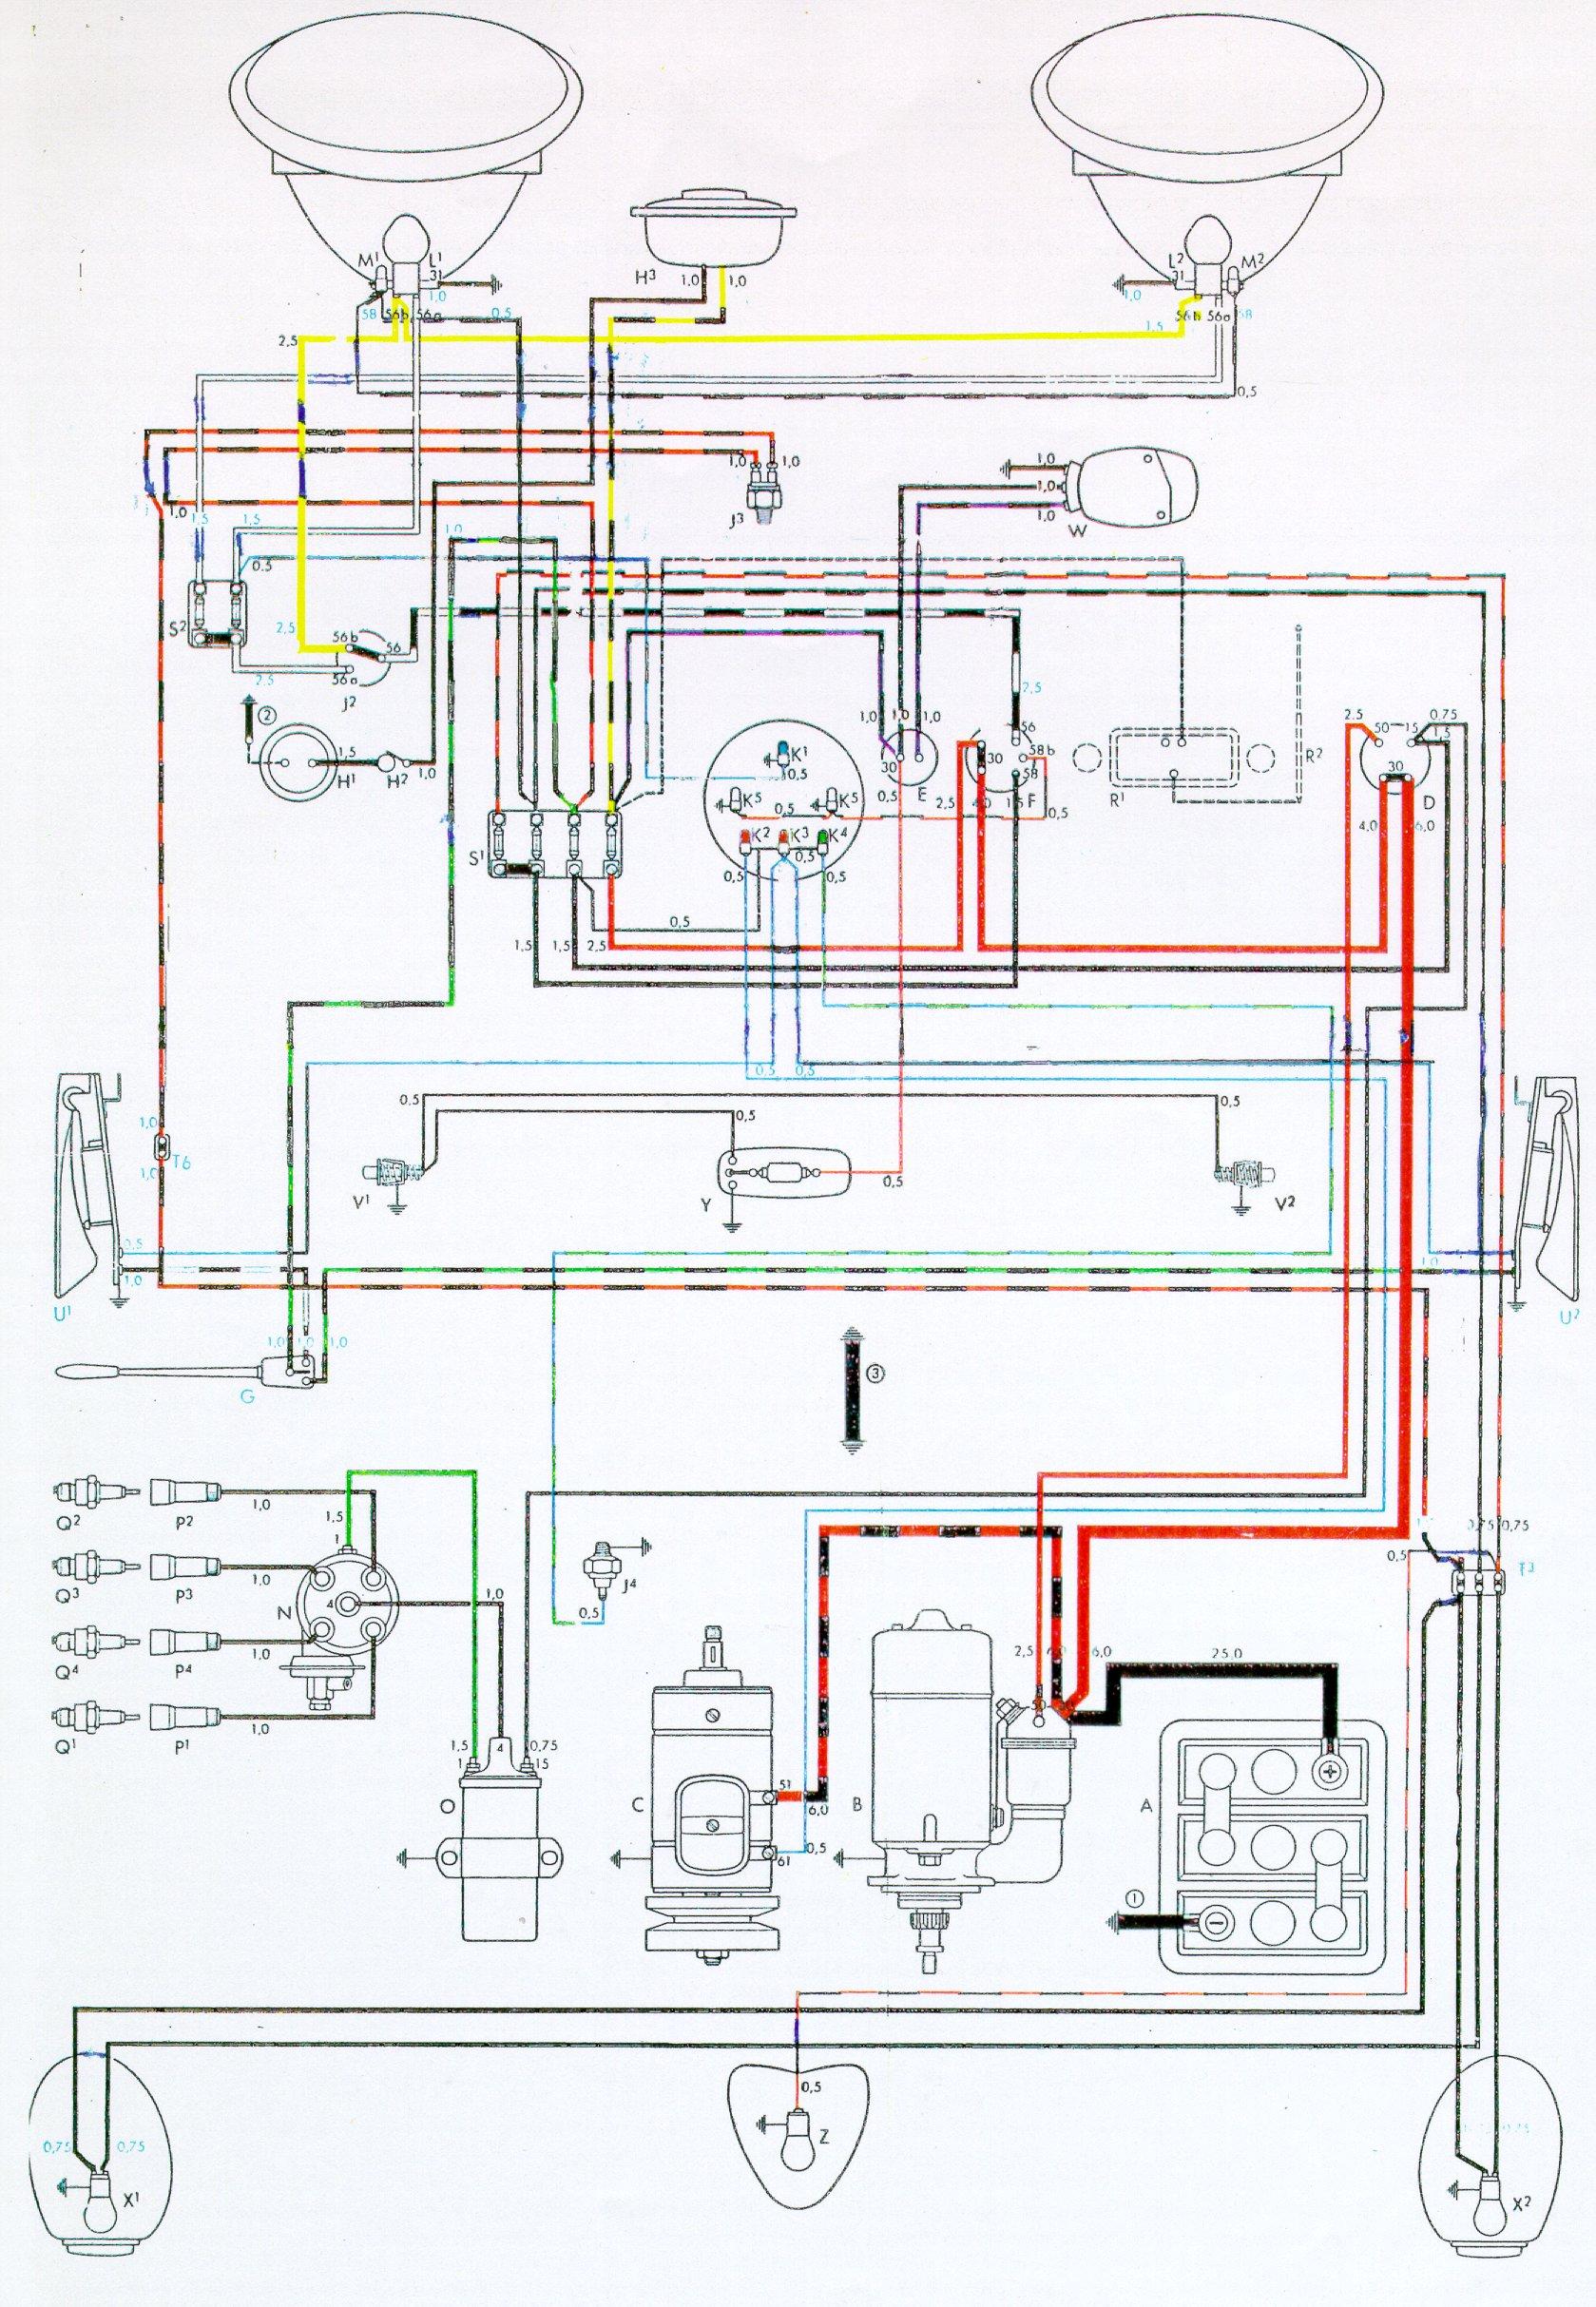 Surprising Vintagebus Com Vw Bus And Other Wiring Diagrams Wiring Cloud Licukshollocom